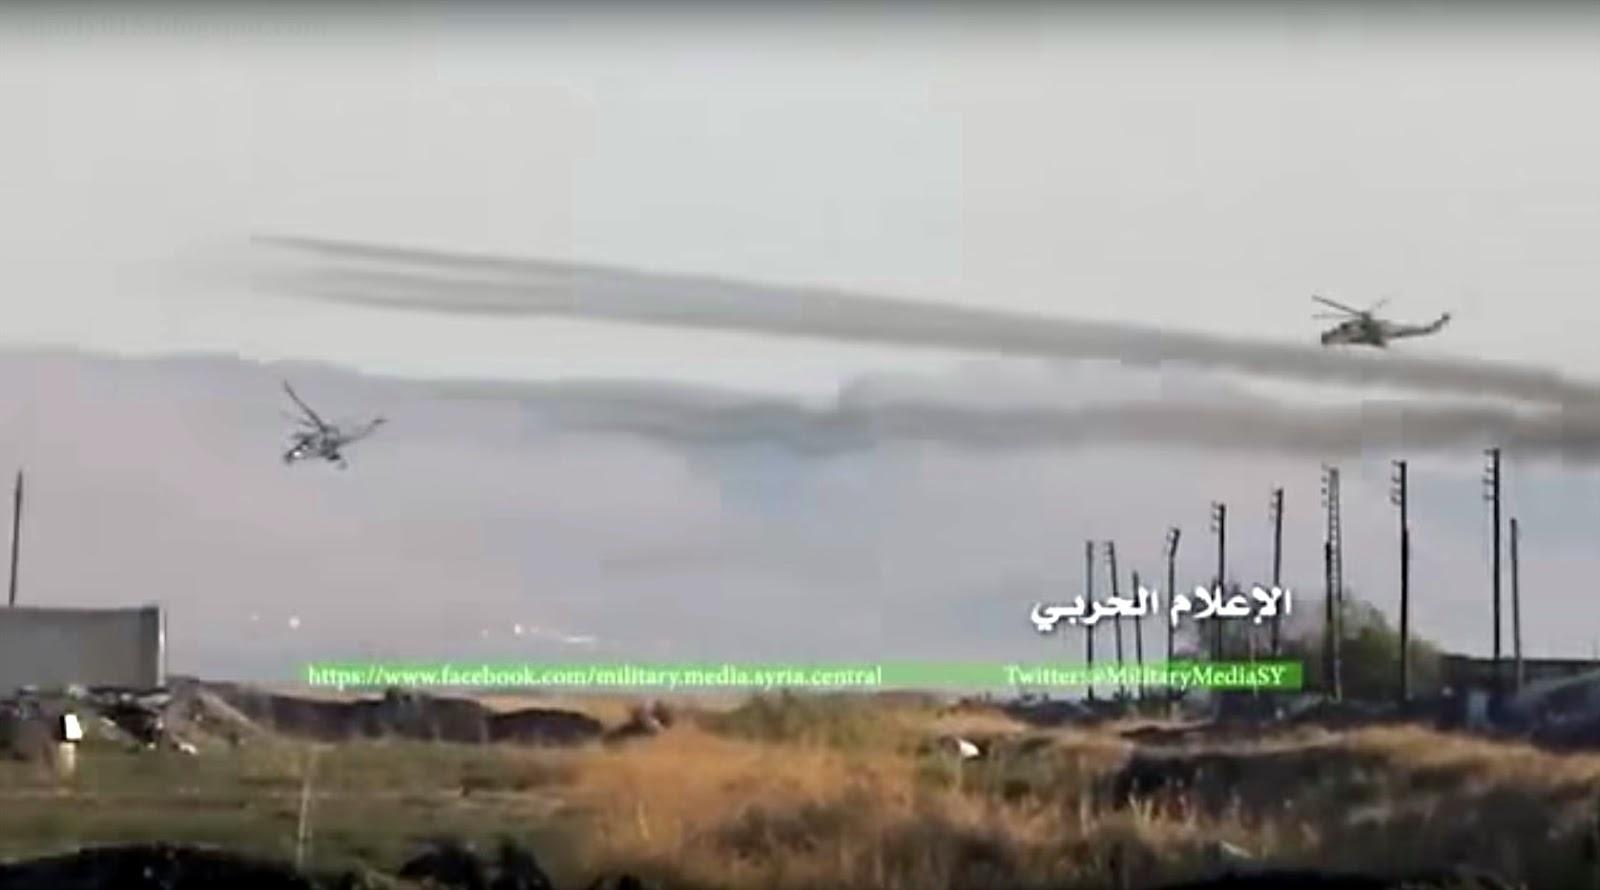 Rusia - Página 27 Siria%2Bhinds%2B3